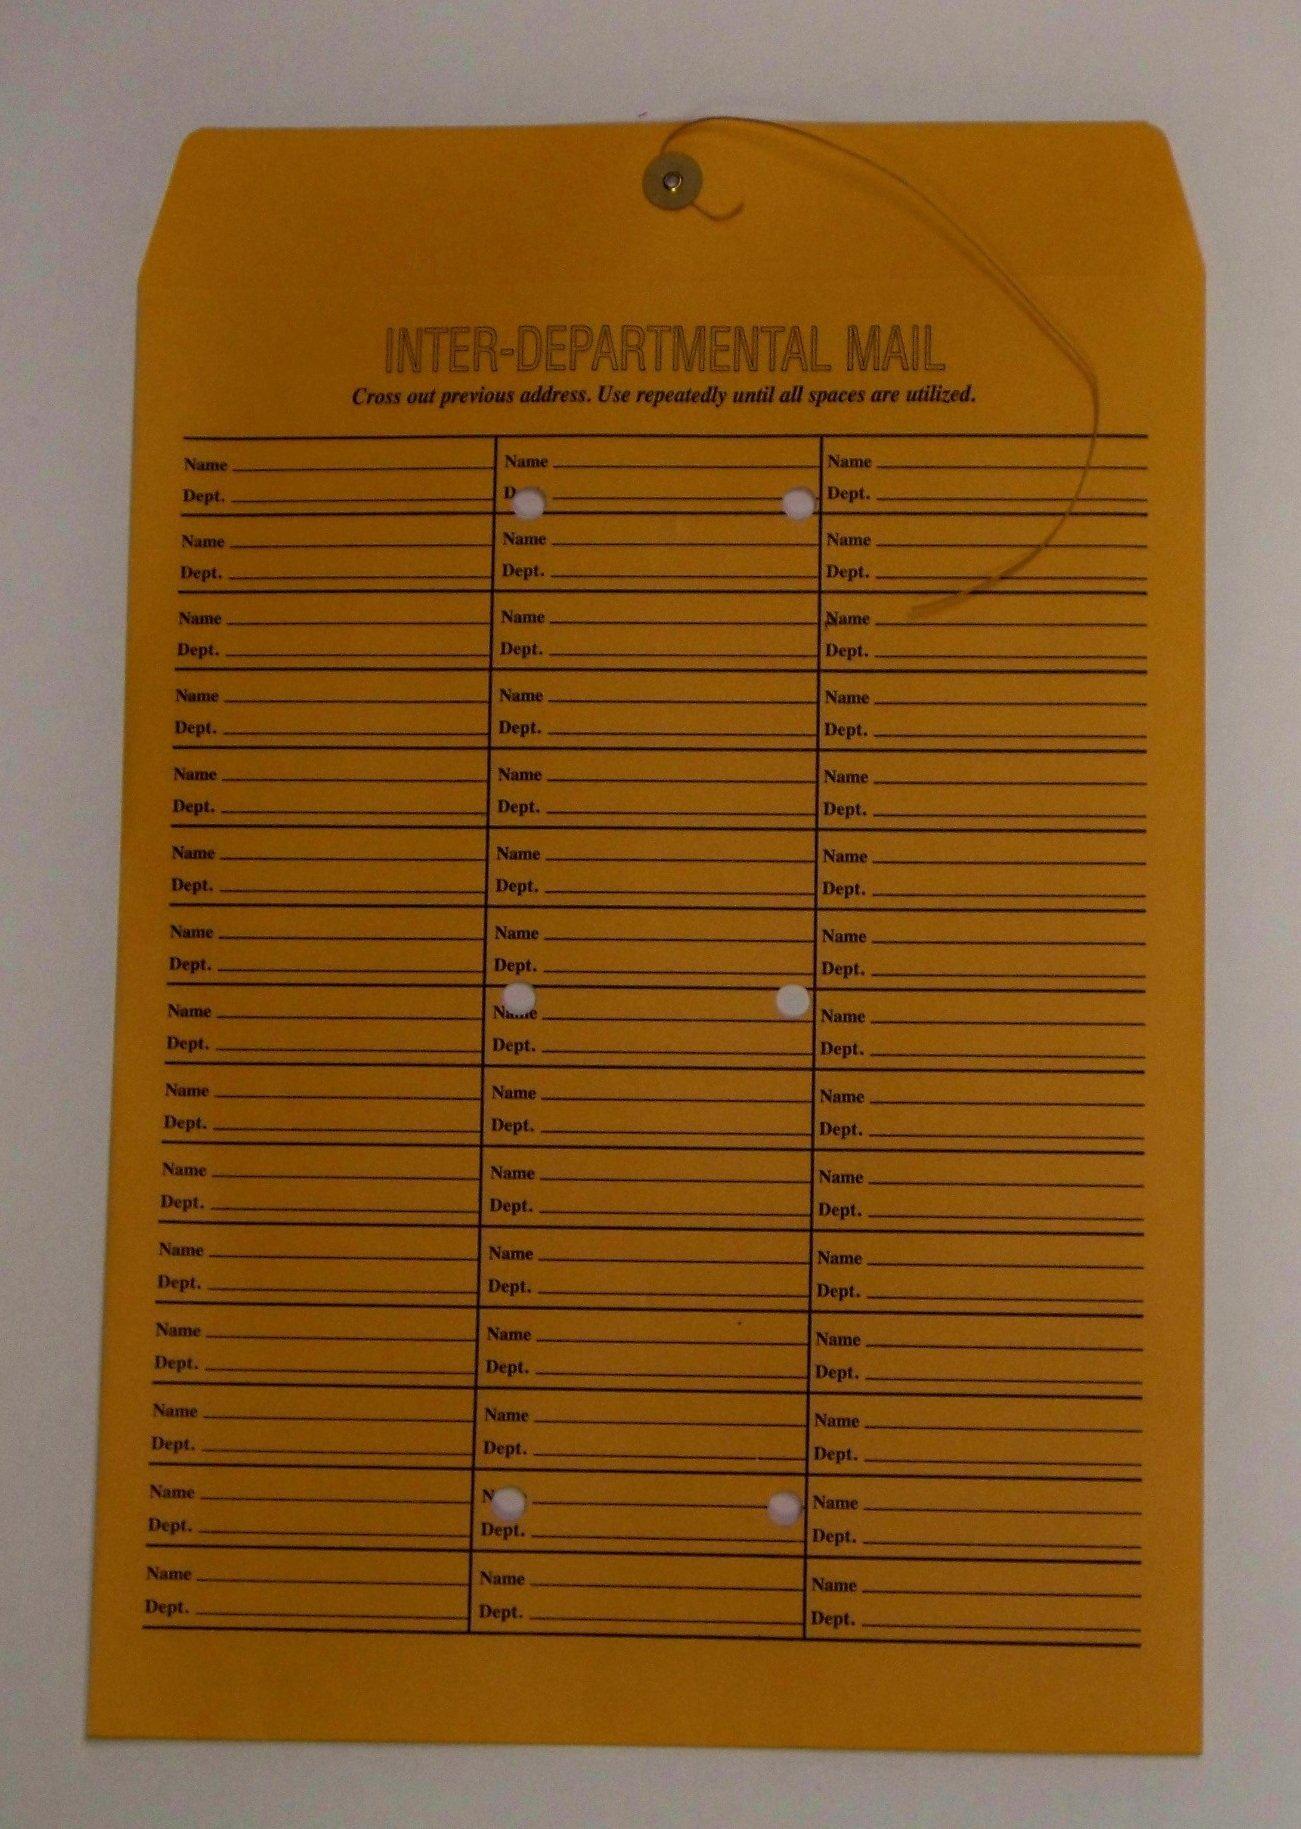 Interdepartmental String-Tie Envelopes, 12 x 16 (Pack of 100) 71 Entries Per Envelope, Printed On Both Sides